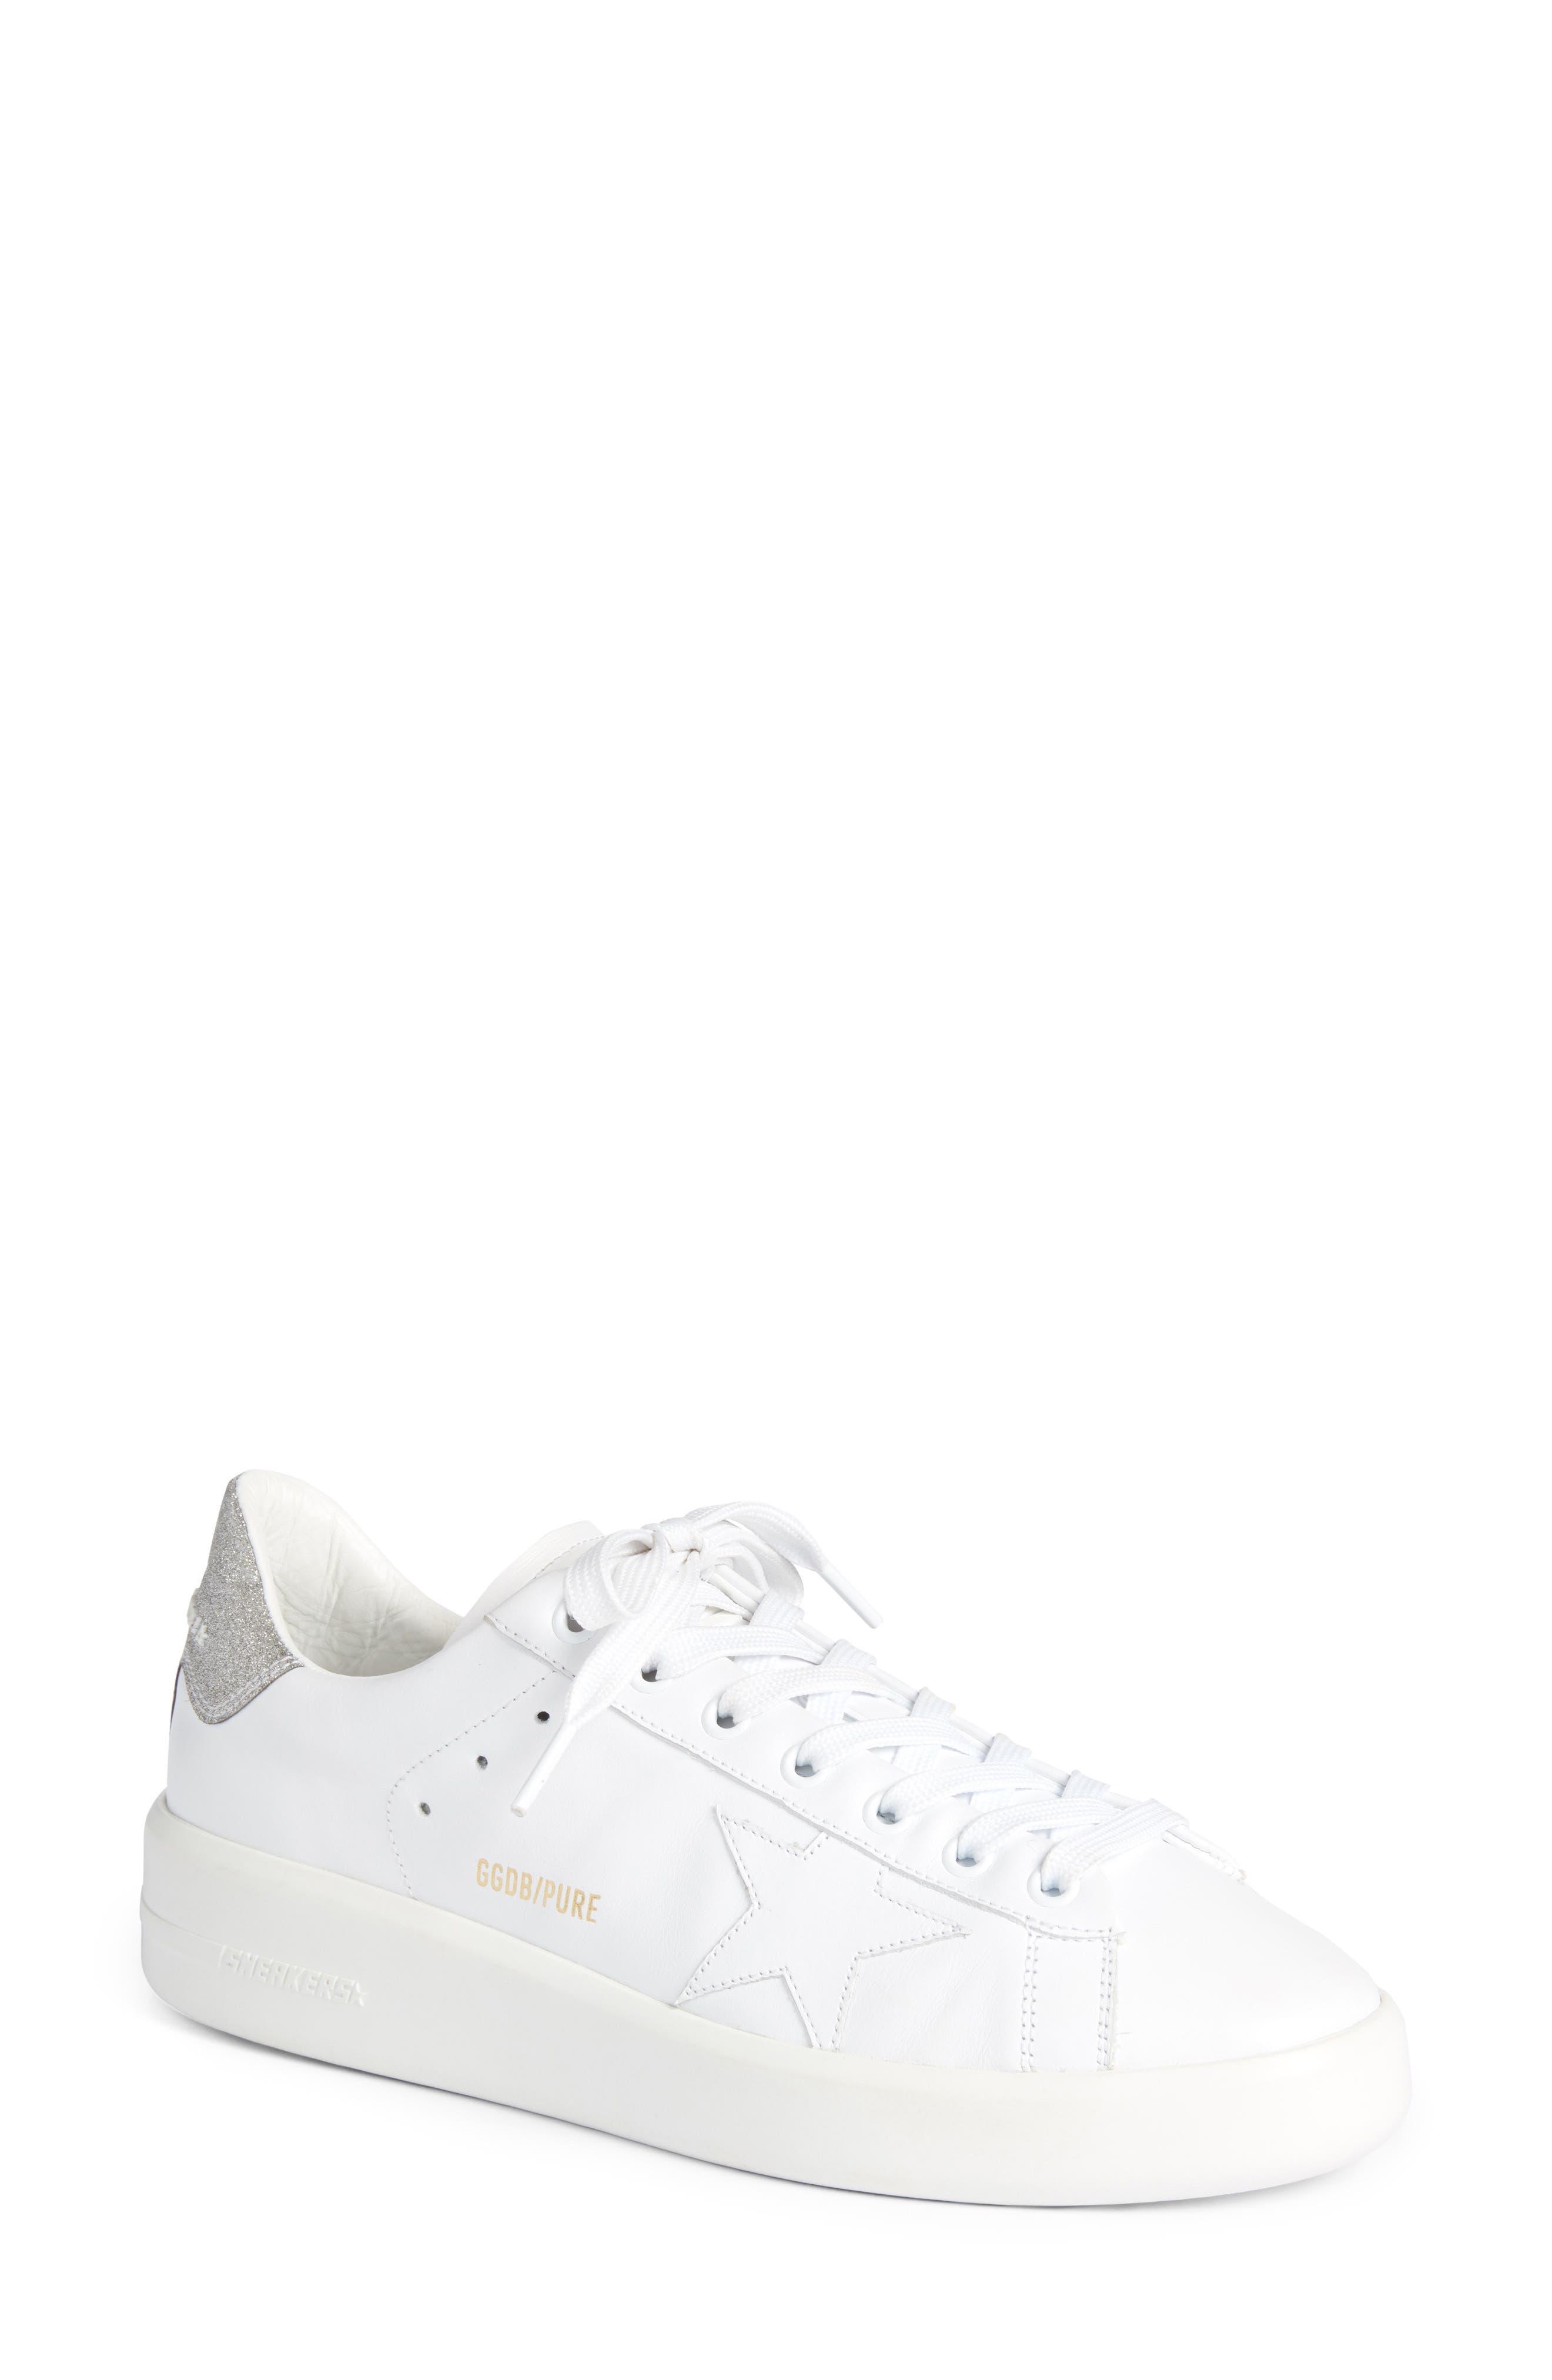 Golden Goose PURESTAR Sneaker (Women